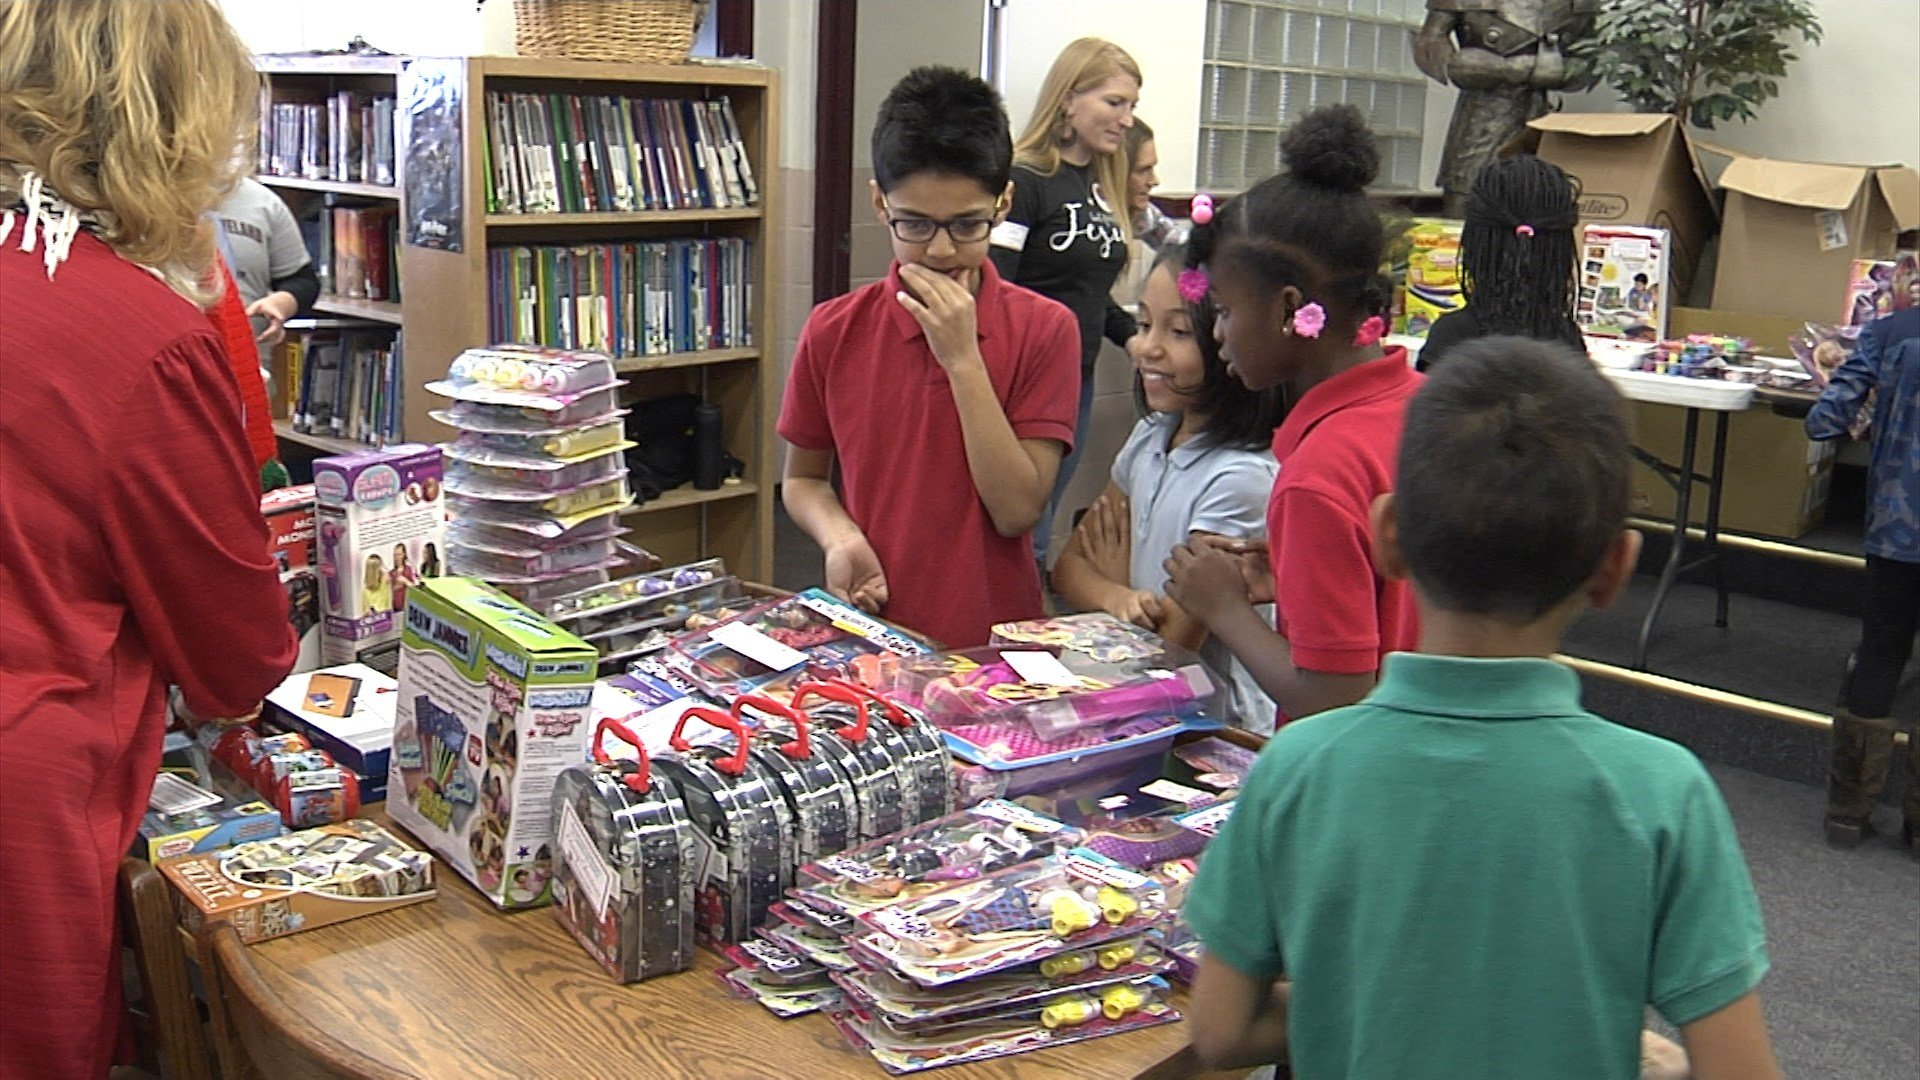 Church Donates 600 Gifts to Neighborhood School - Erie News Now ...